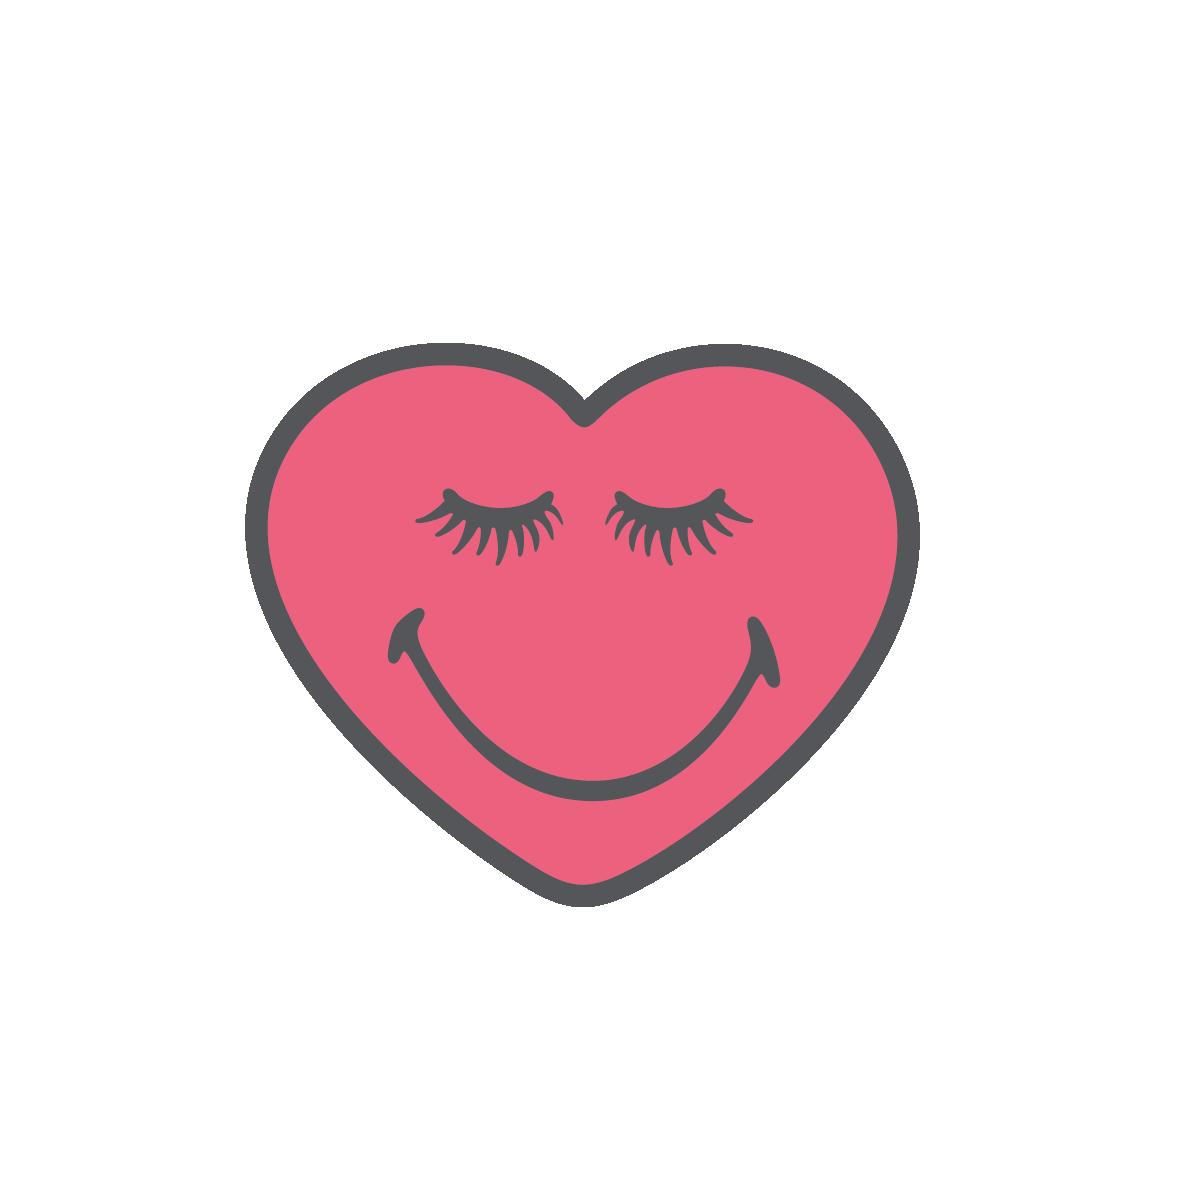 Ciaté X SmileyWorld messages sticker-7